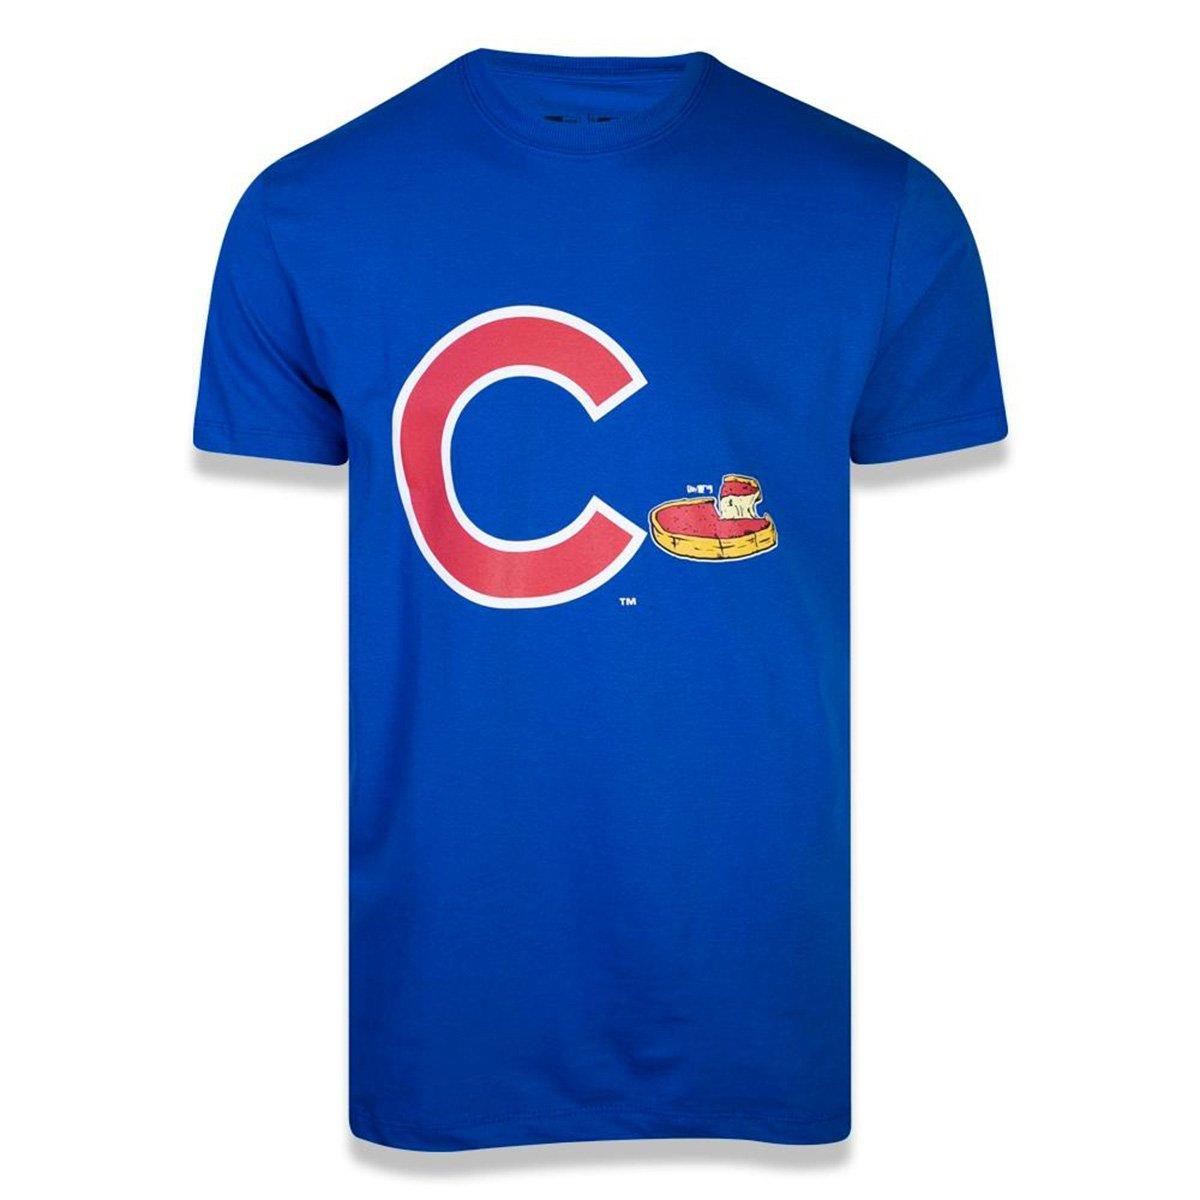 https://static.netshoes.com.br/produtos/camiseta-mlb-chicago-cubs-new-era-core-team-eat-masculina/10/IJX-8451-310/IJX-8451-310_zoom1.jpg?ts=1601414547